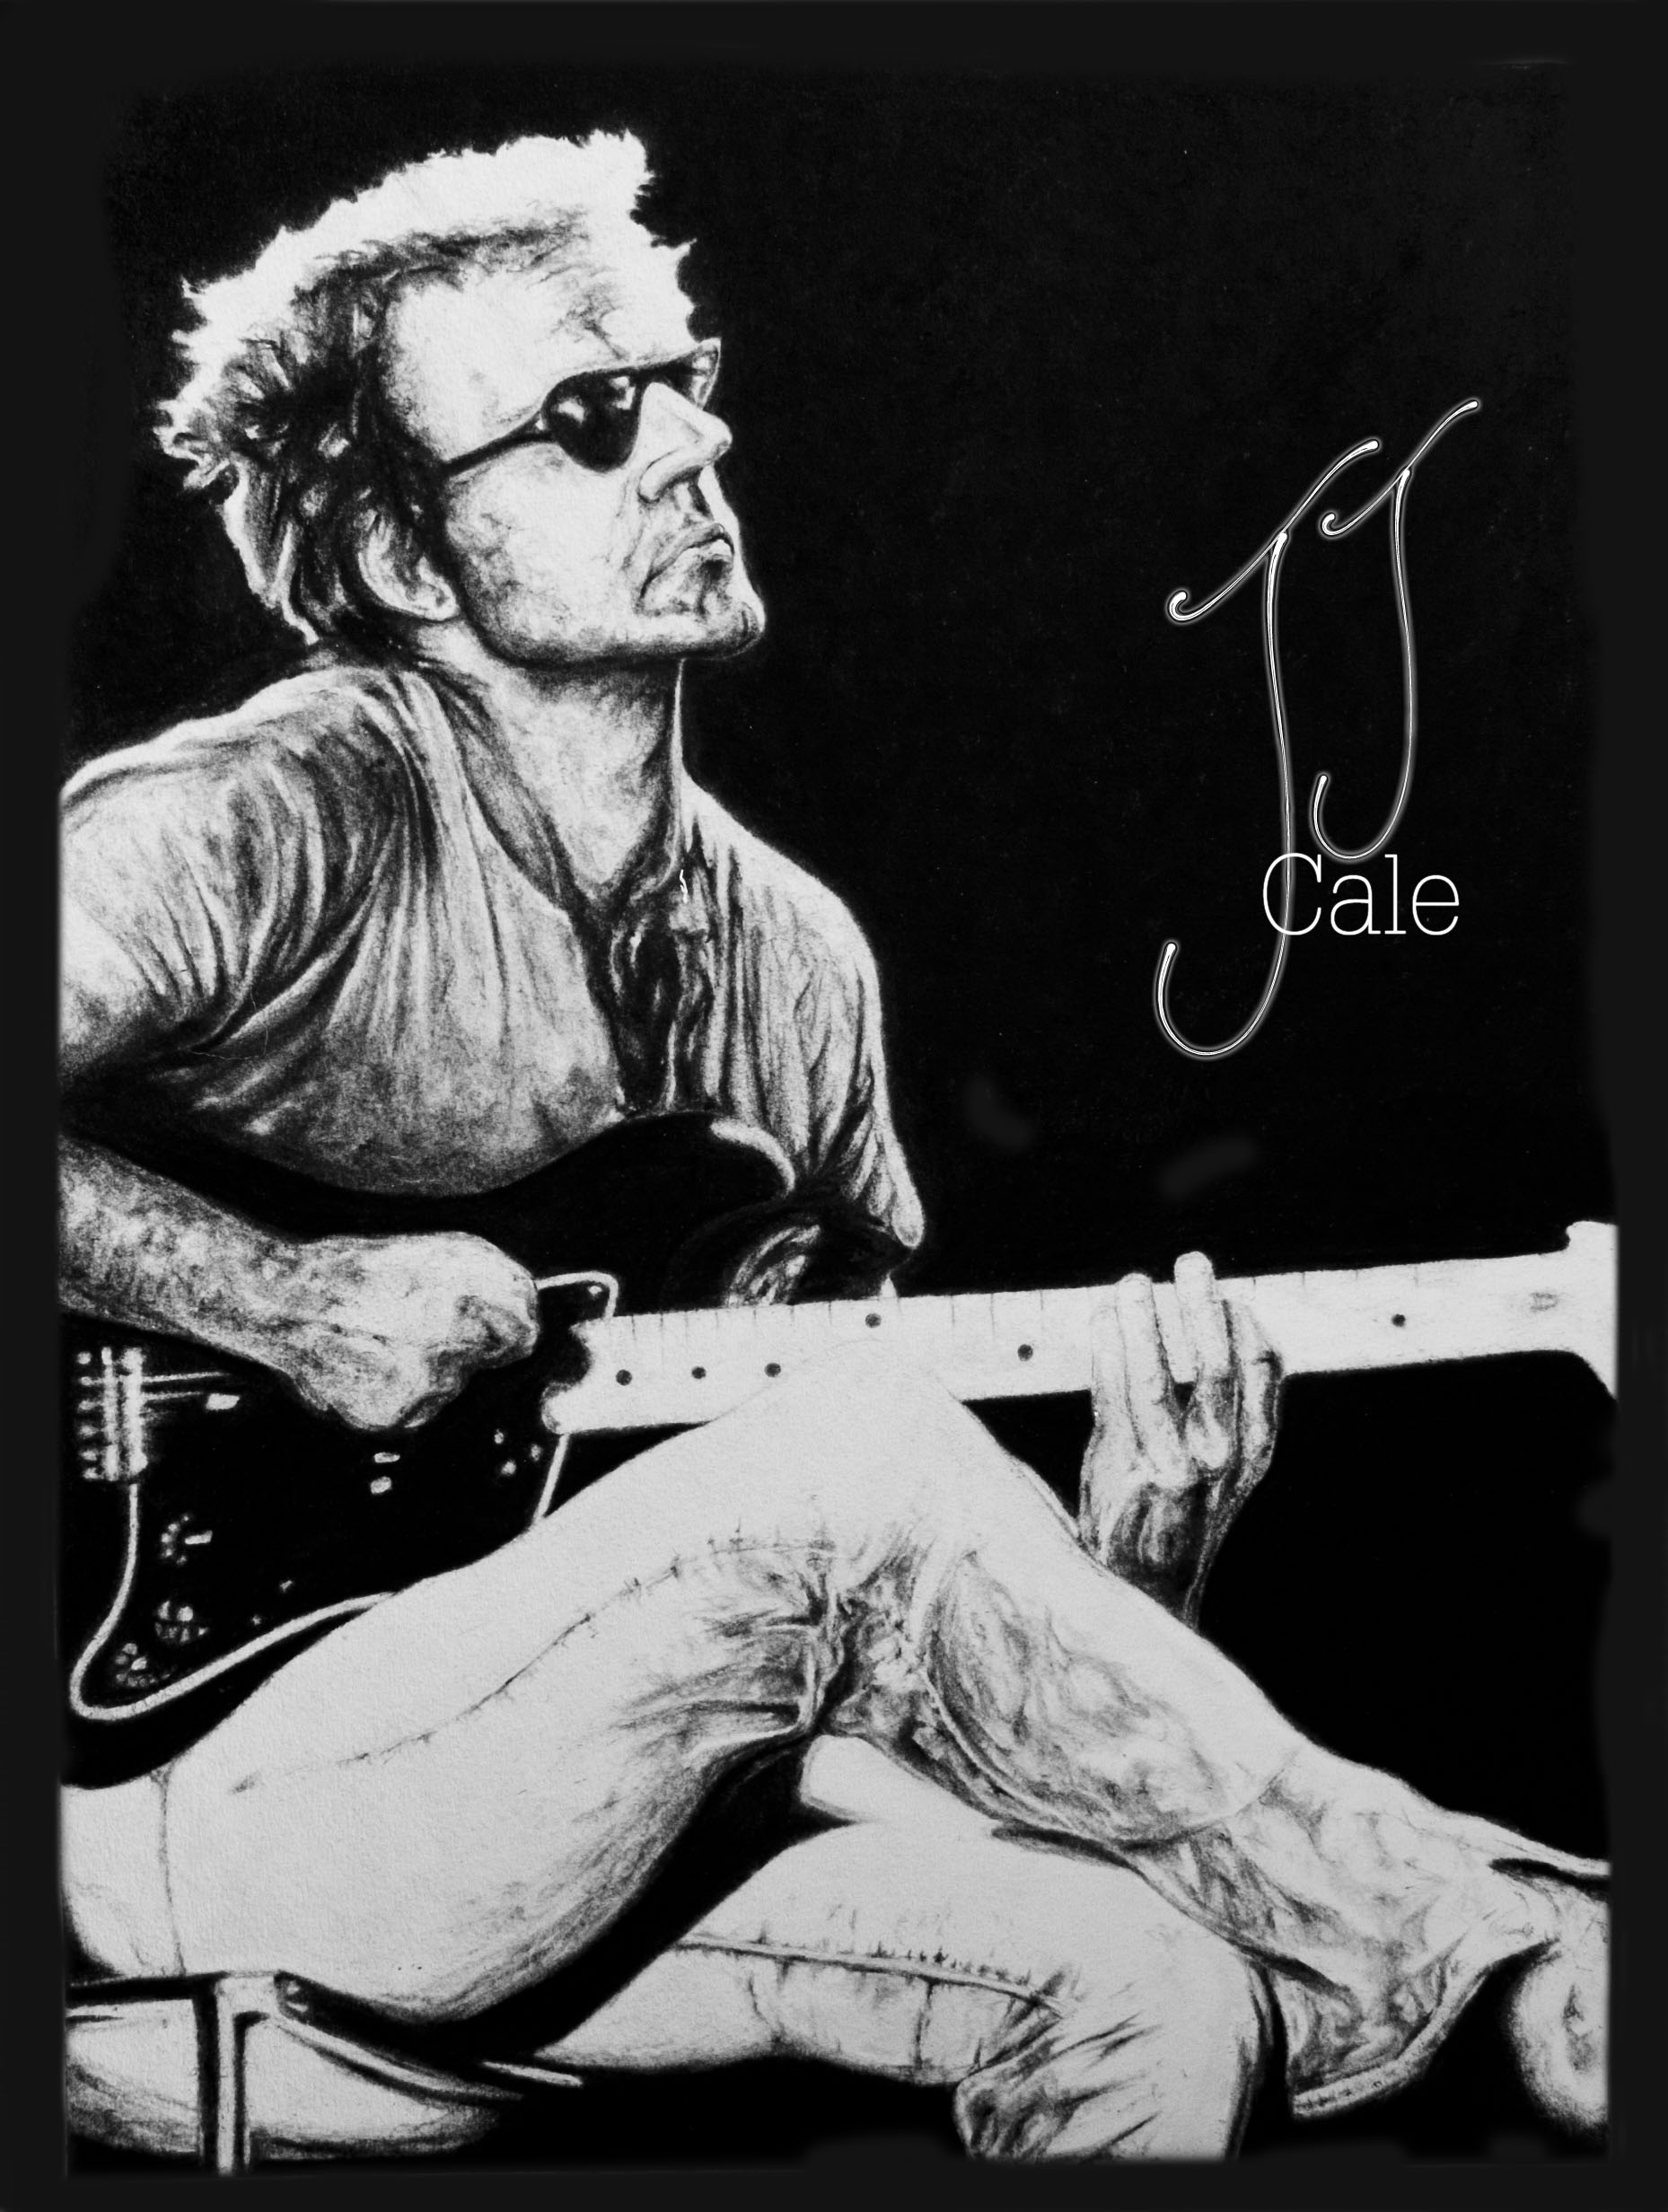 J.J. Cale Tribute